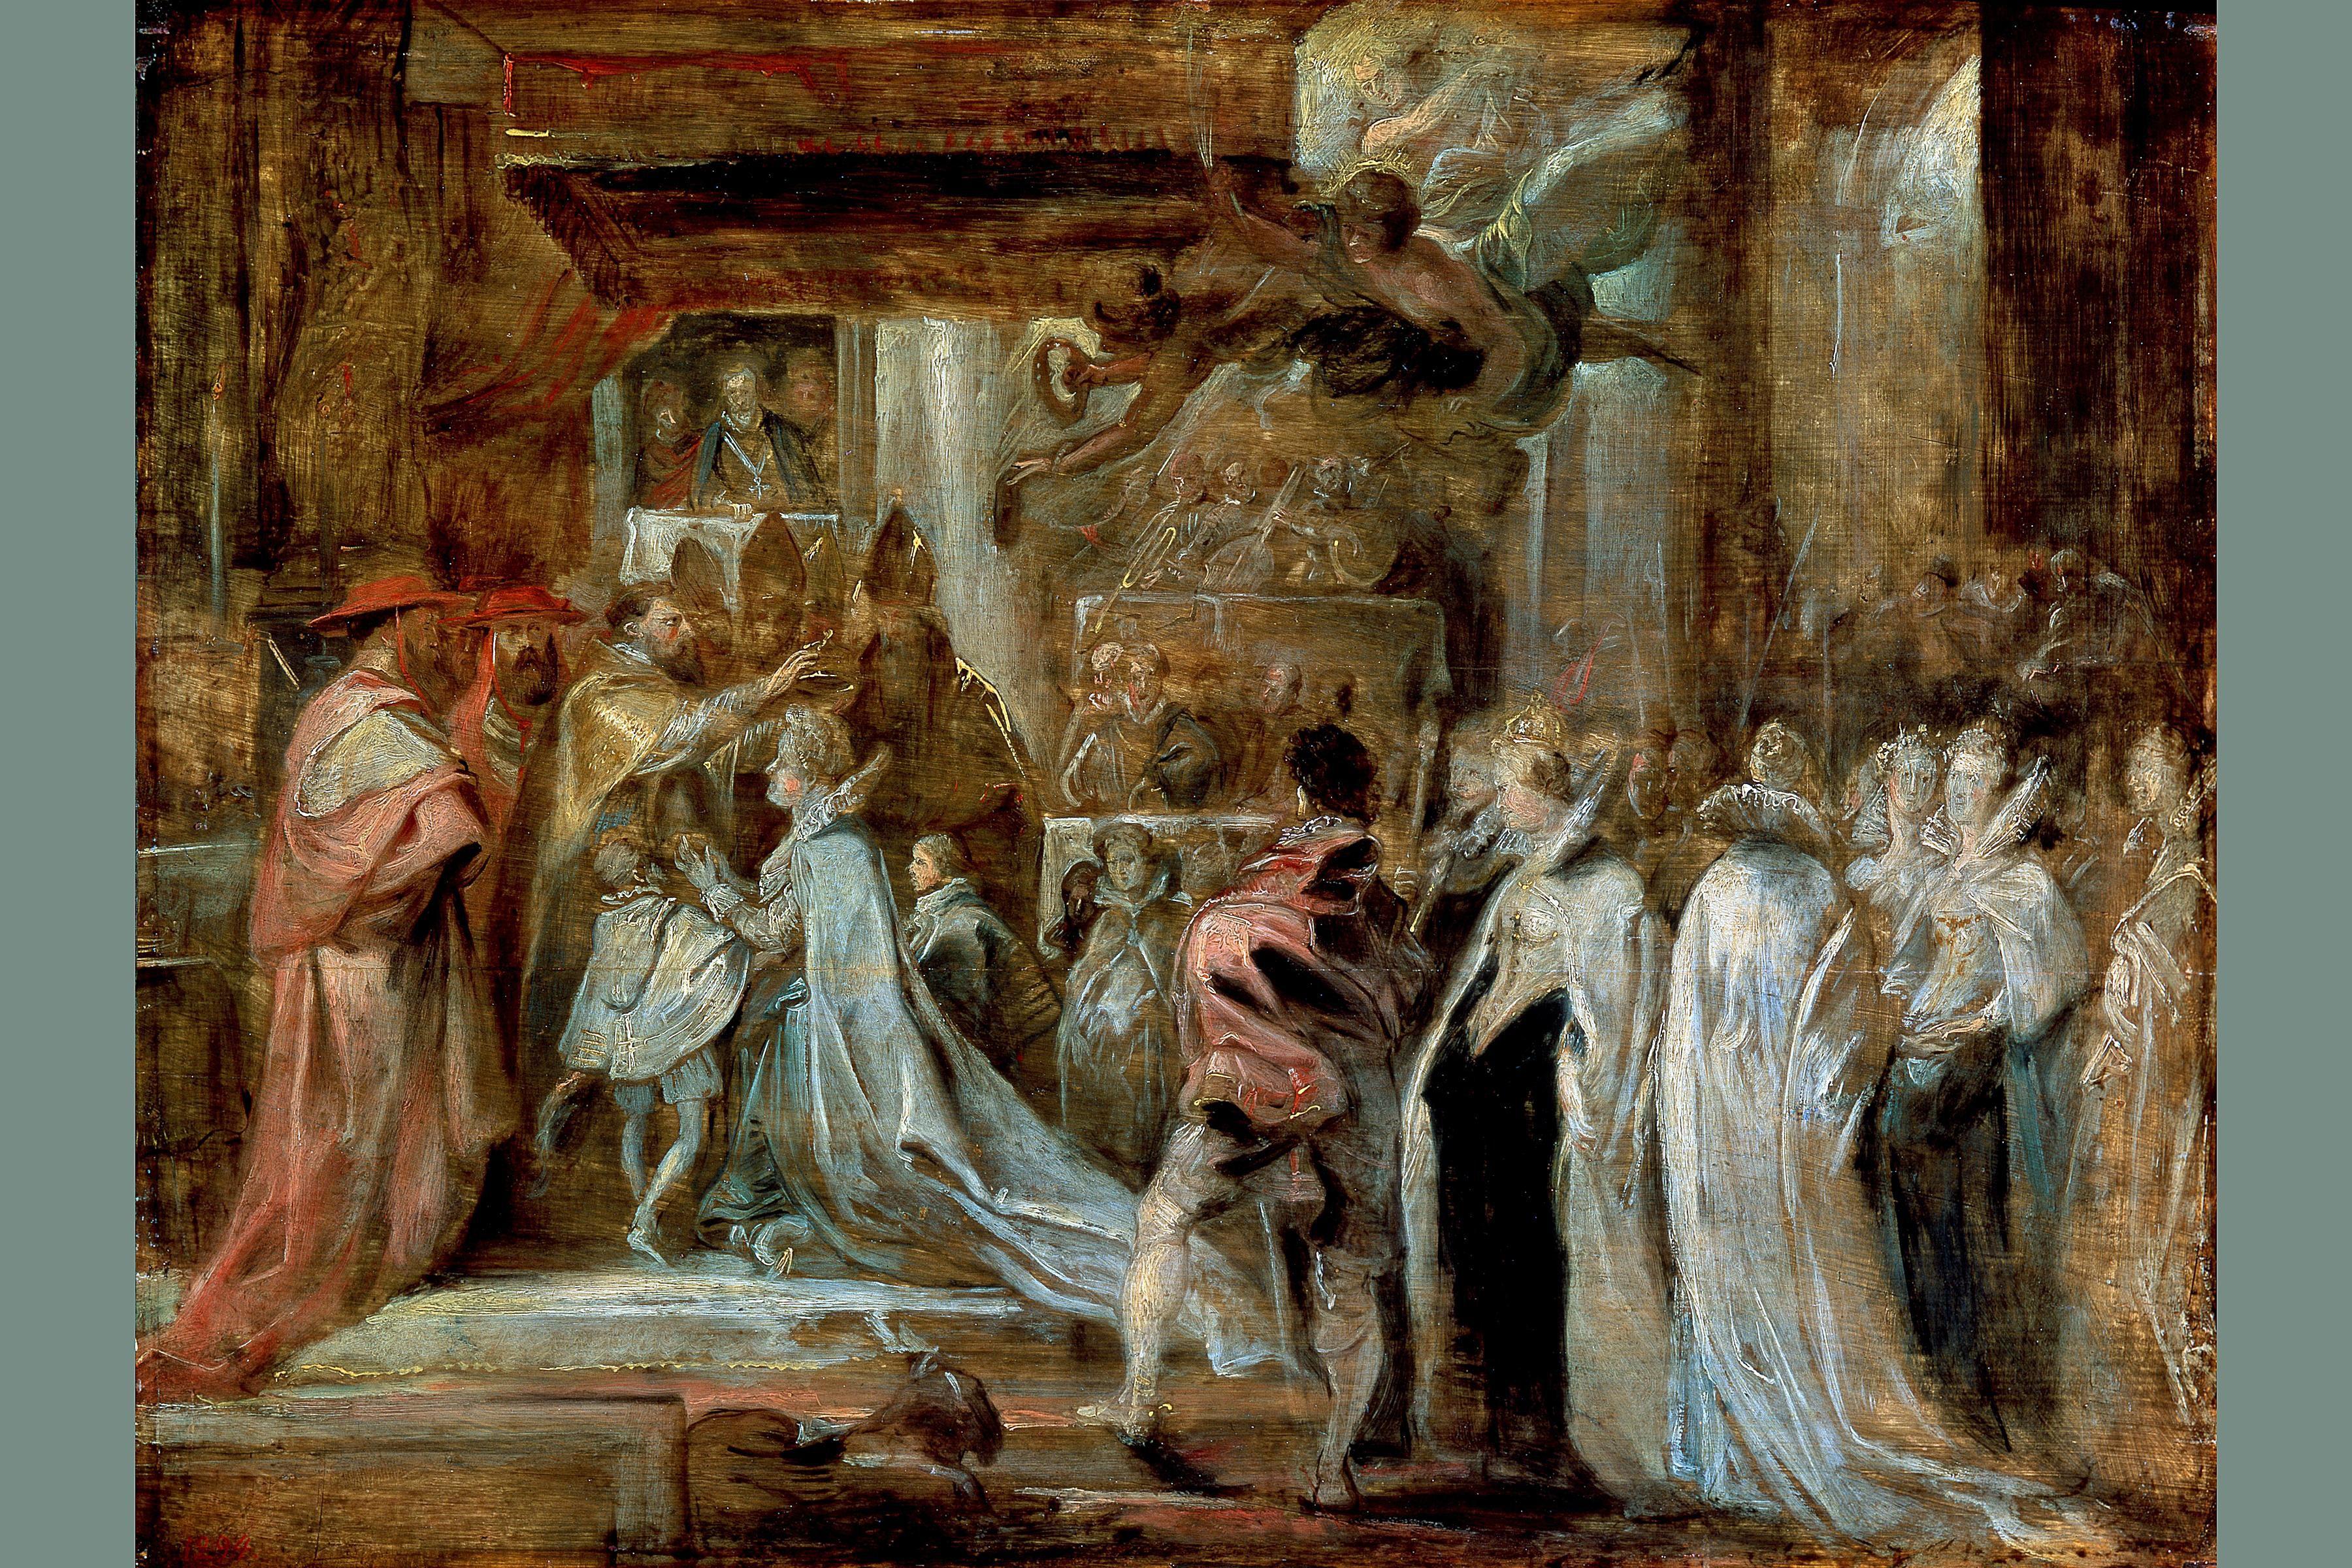 'The Coronation of Marie de' Medici', 1622. Artist: Peter Paul Rubens